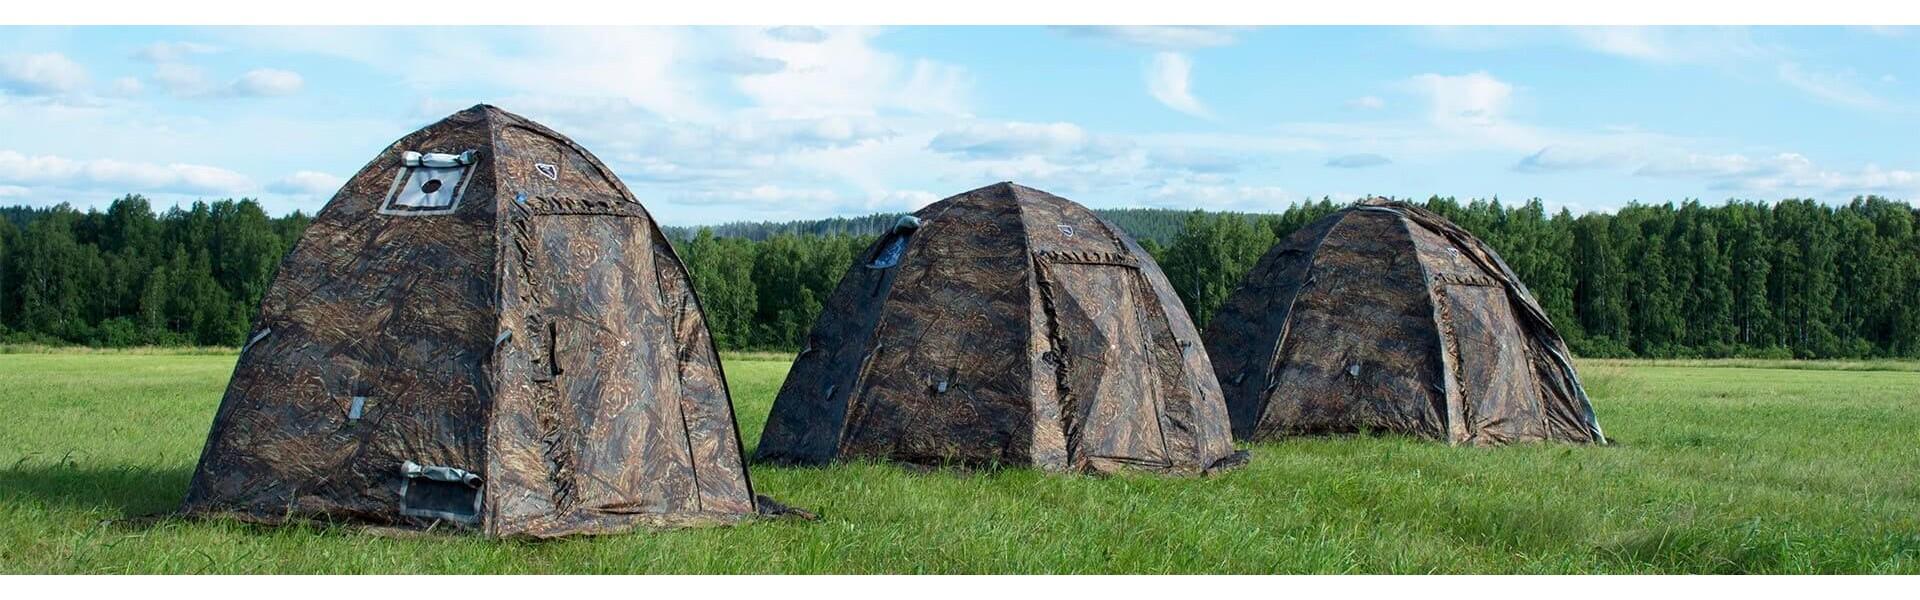 Уп палатки